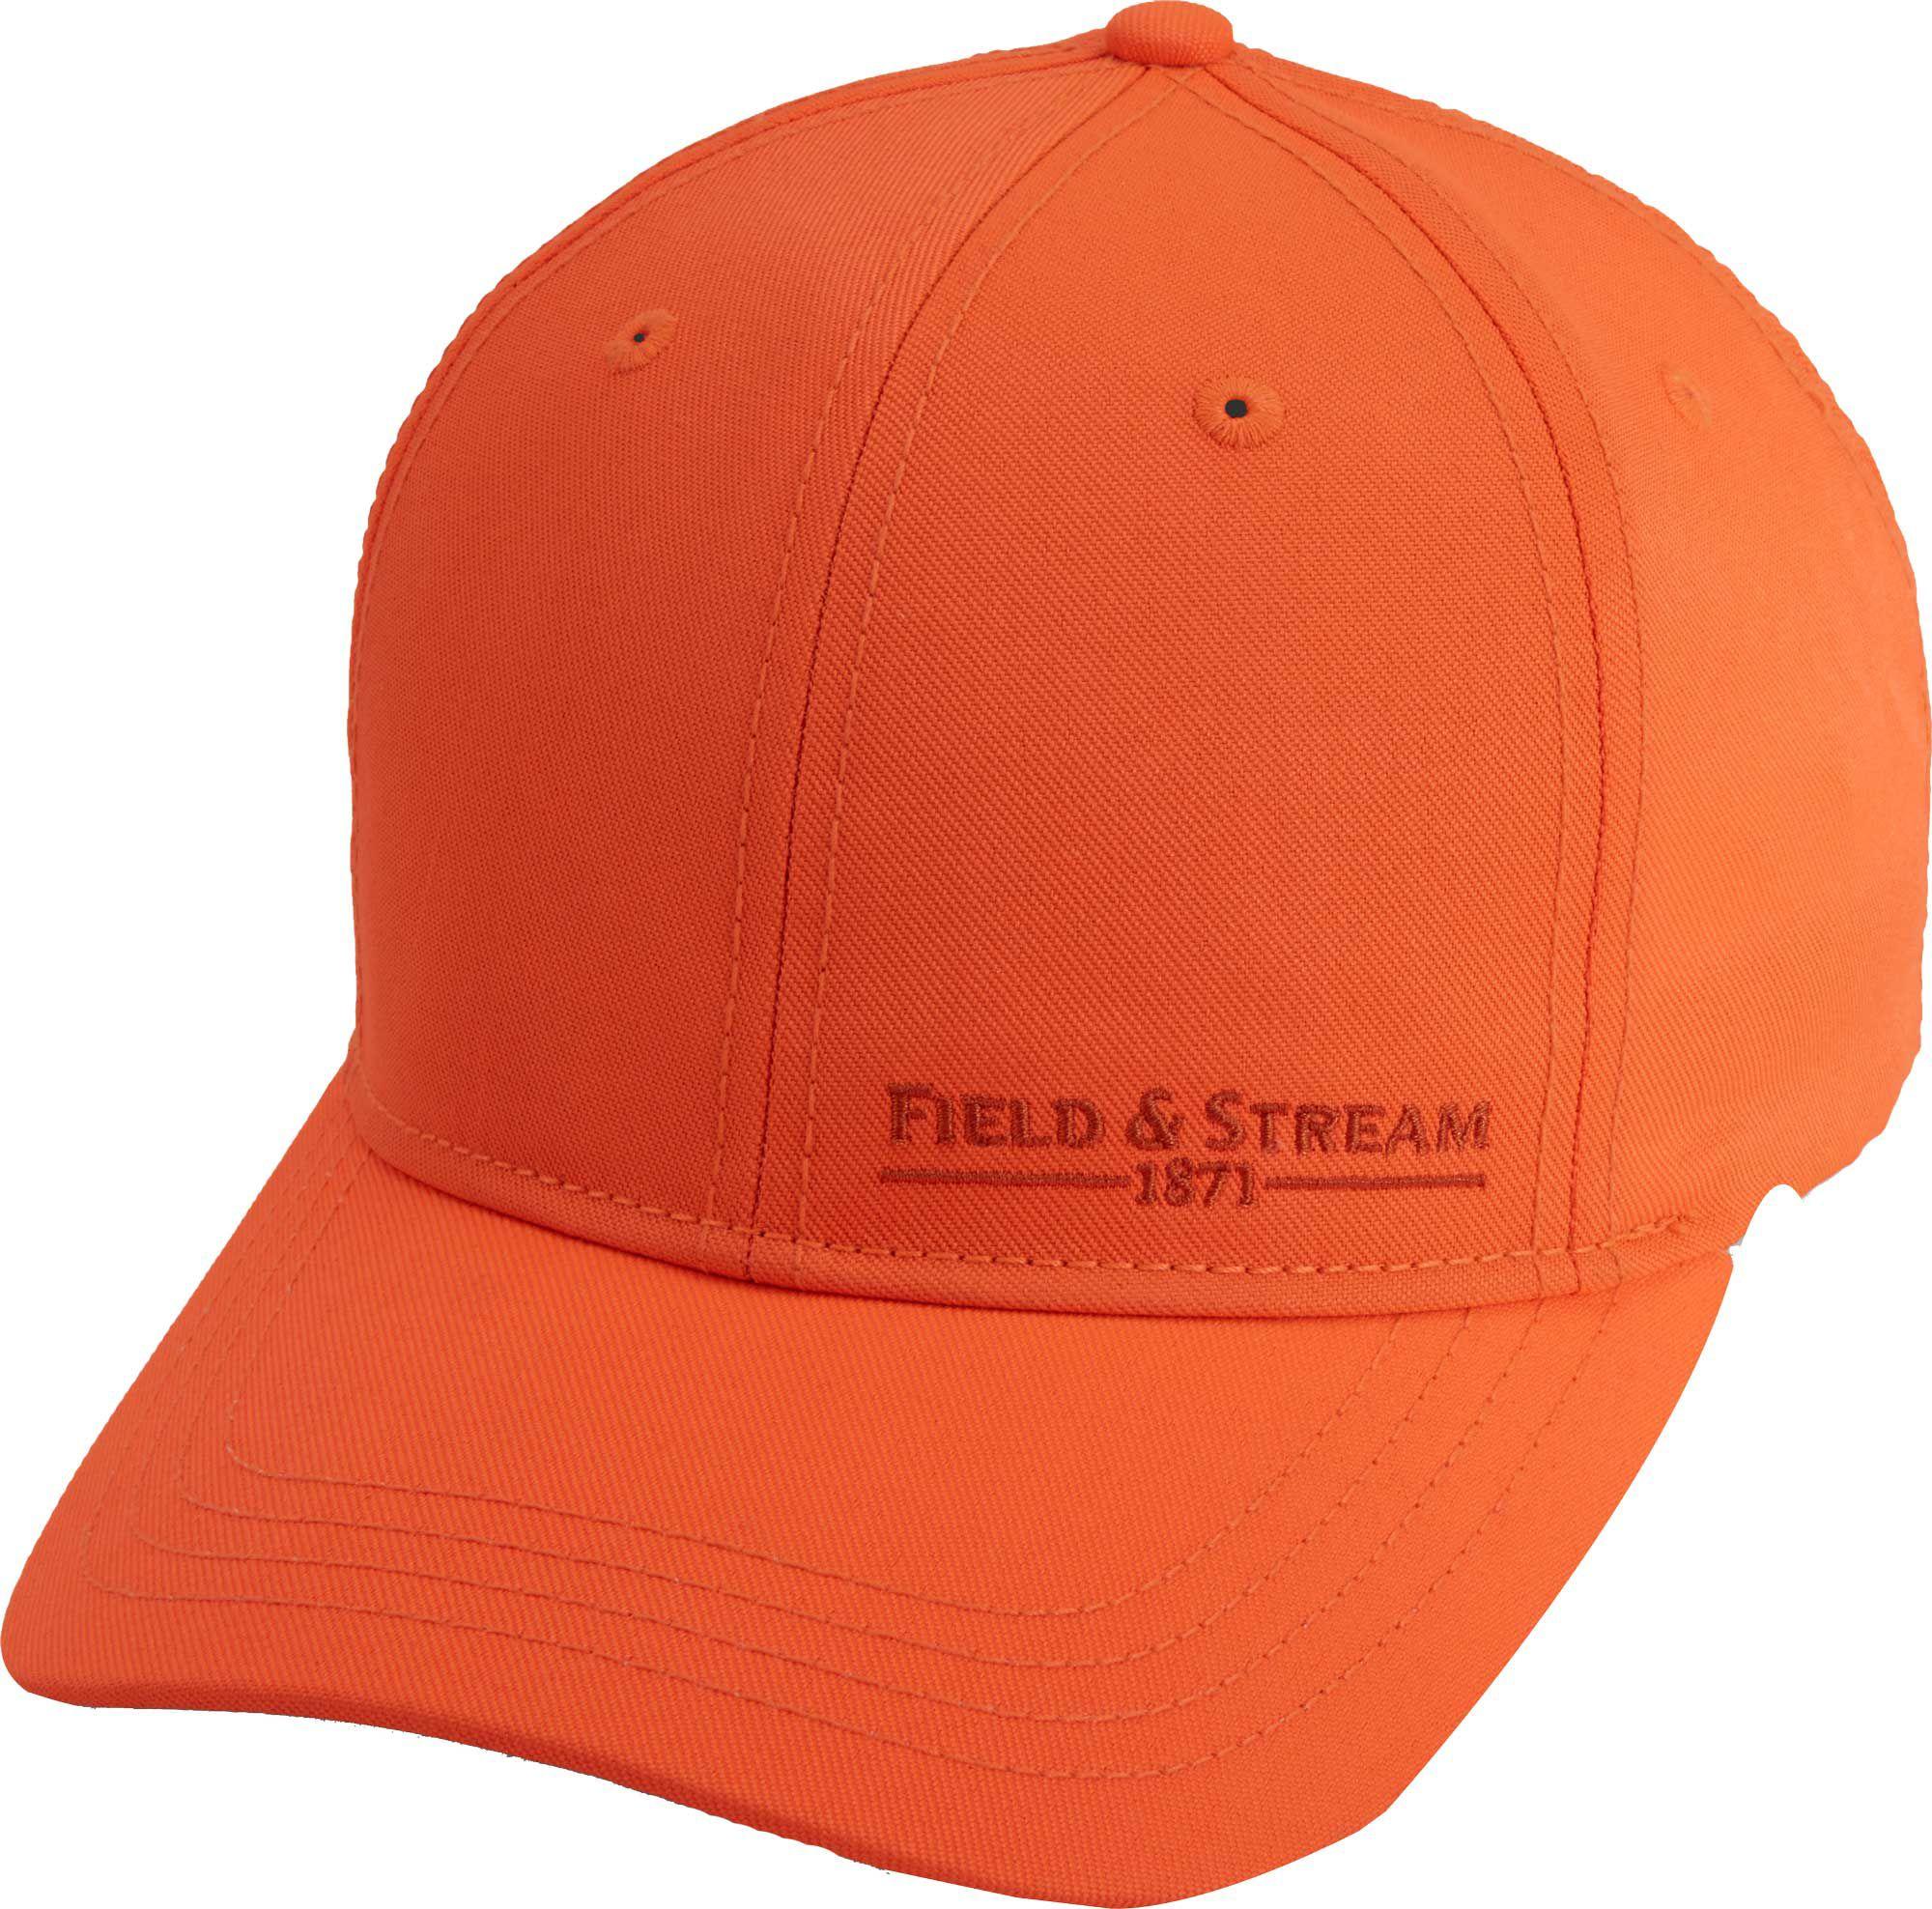 133a4ee70 Free photo: Orange hat - Person, People, Model - Free Download - Jooinn